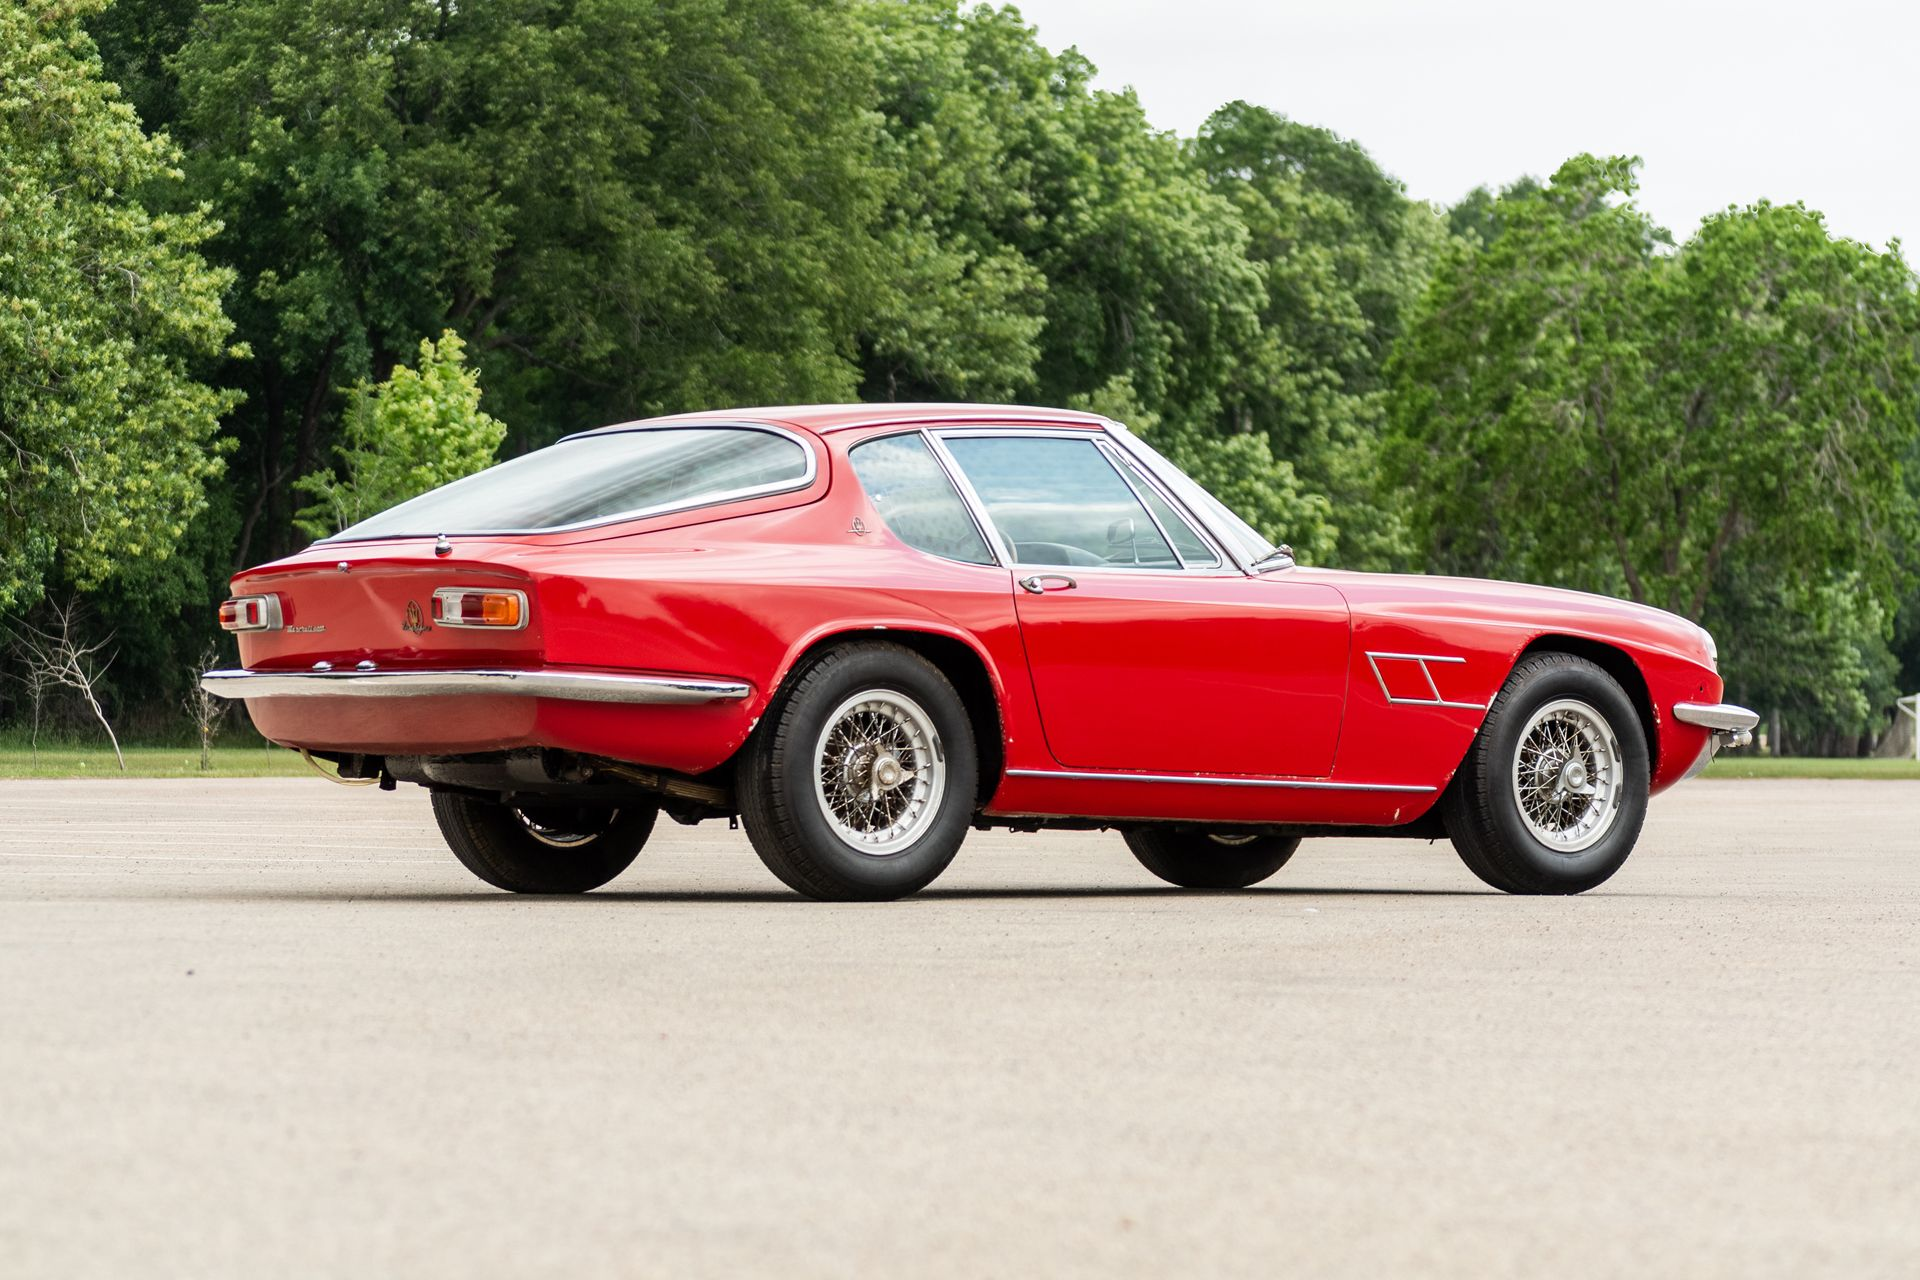 1967 Maserati Mistral 4000 GT Alloy Project   Maserati ...